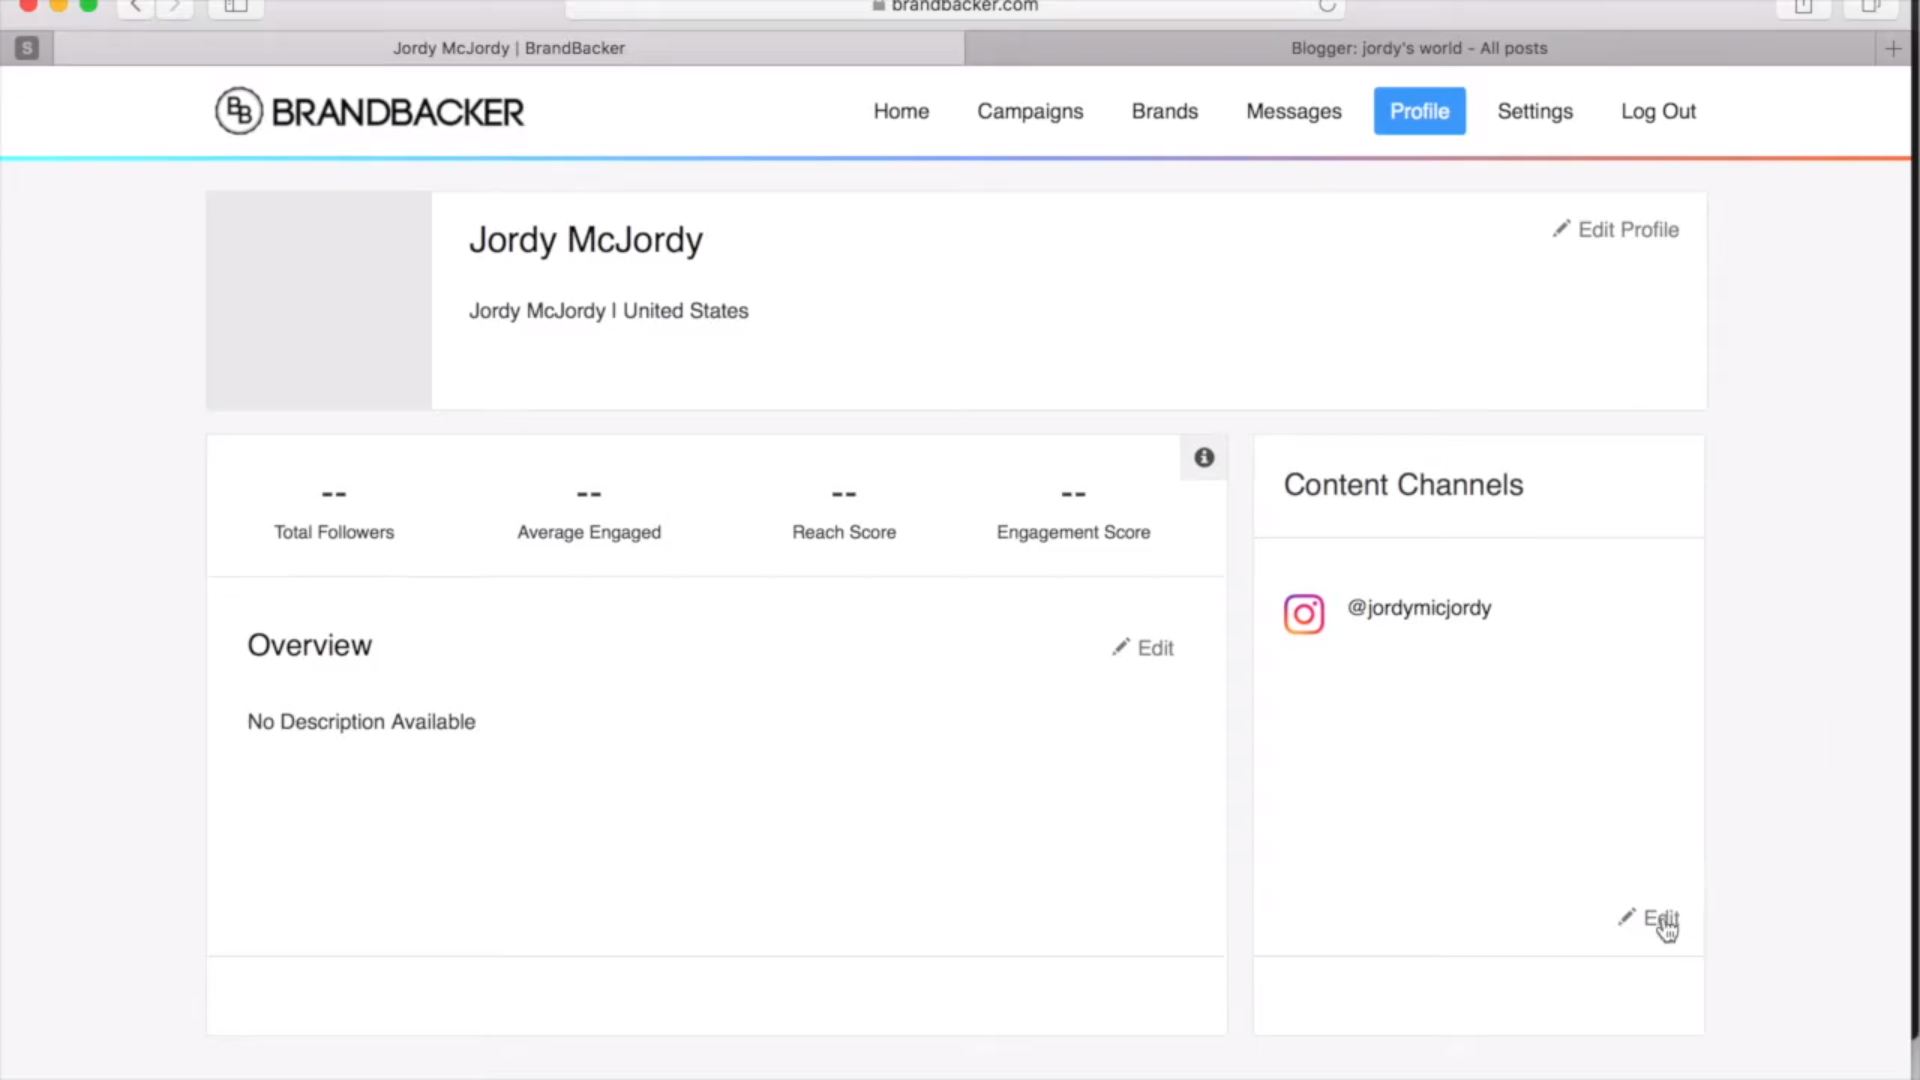 BrandBacker user profile